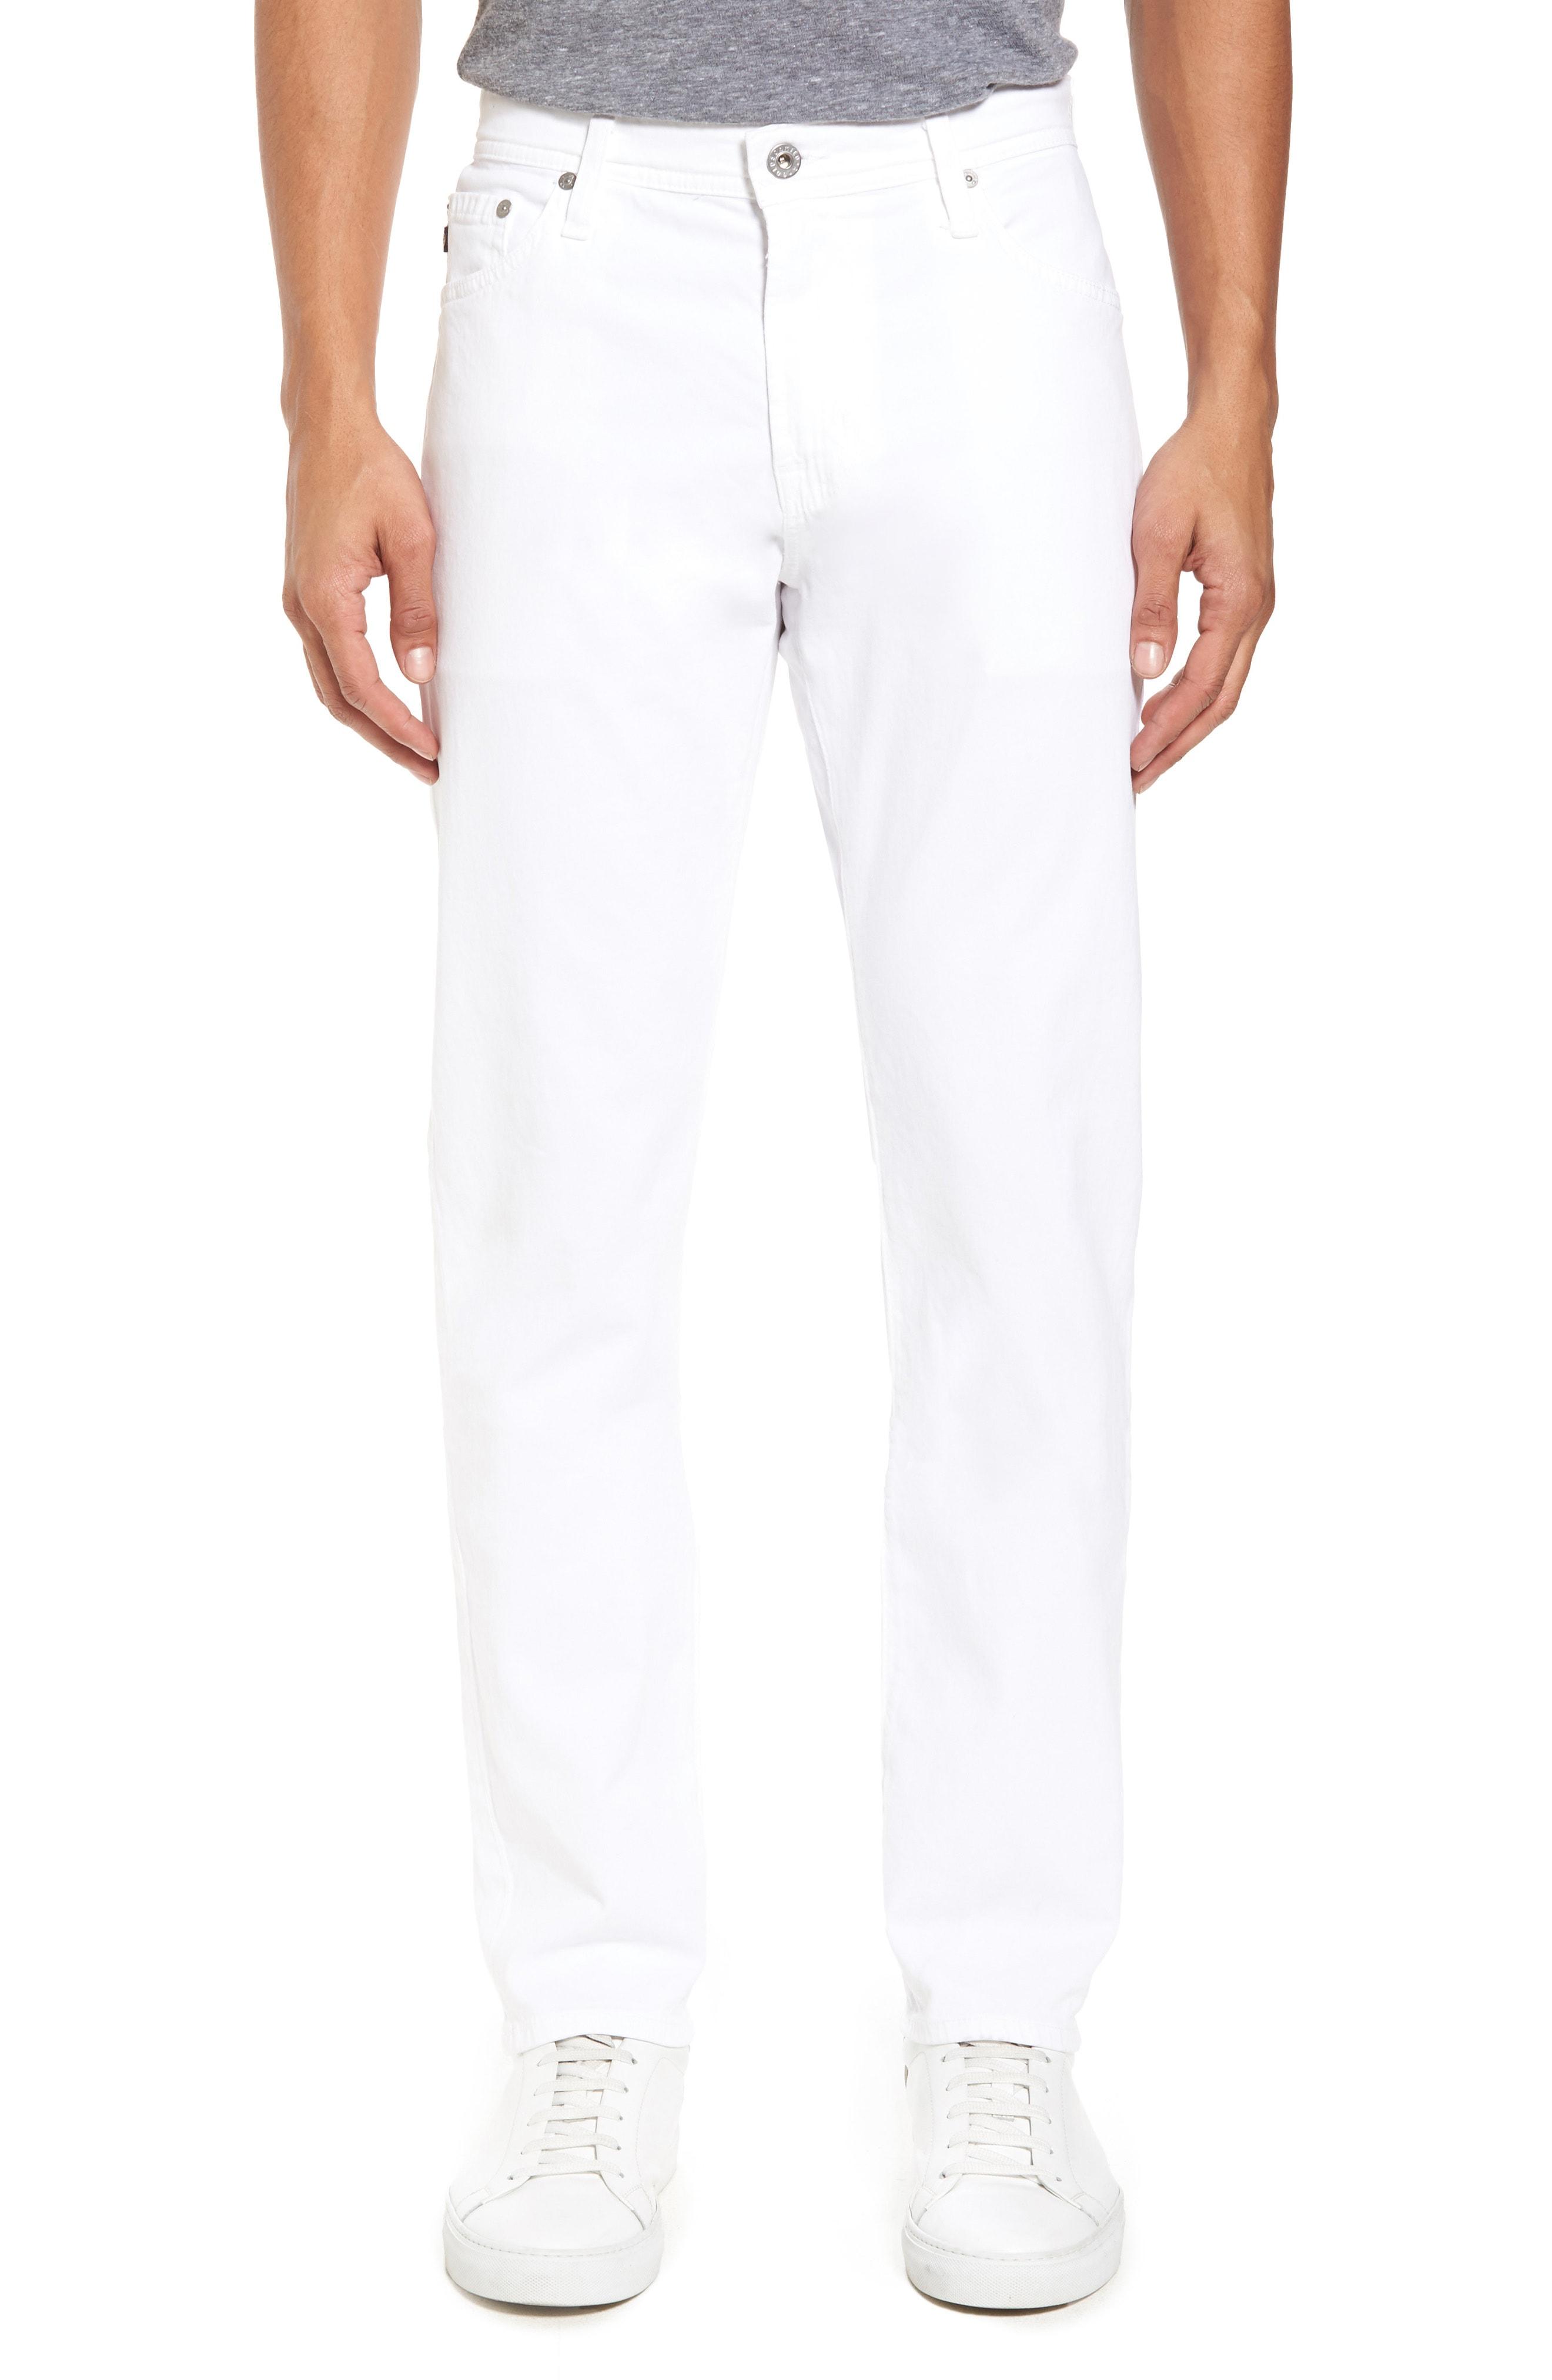 Men's Pants & Trousers | Nordstrom